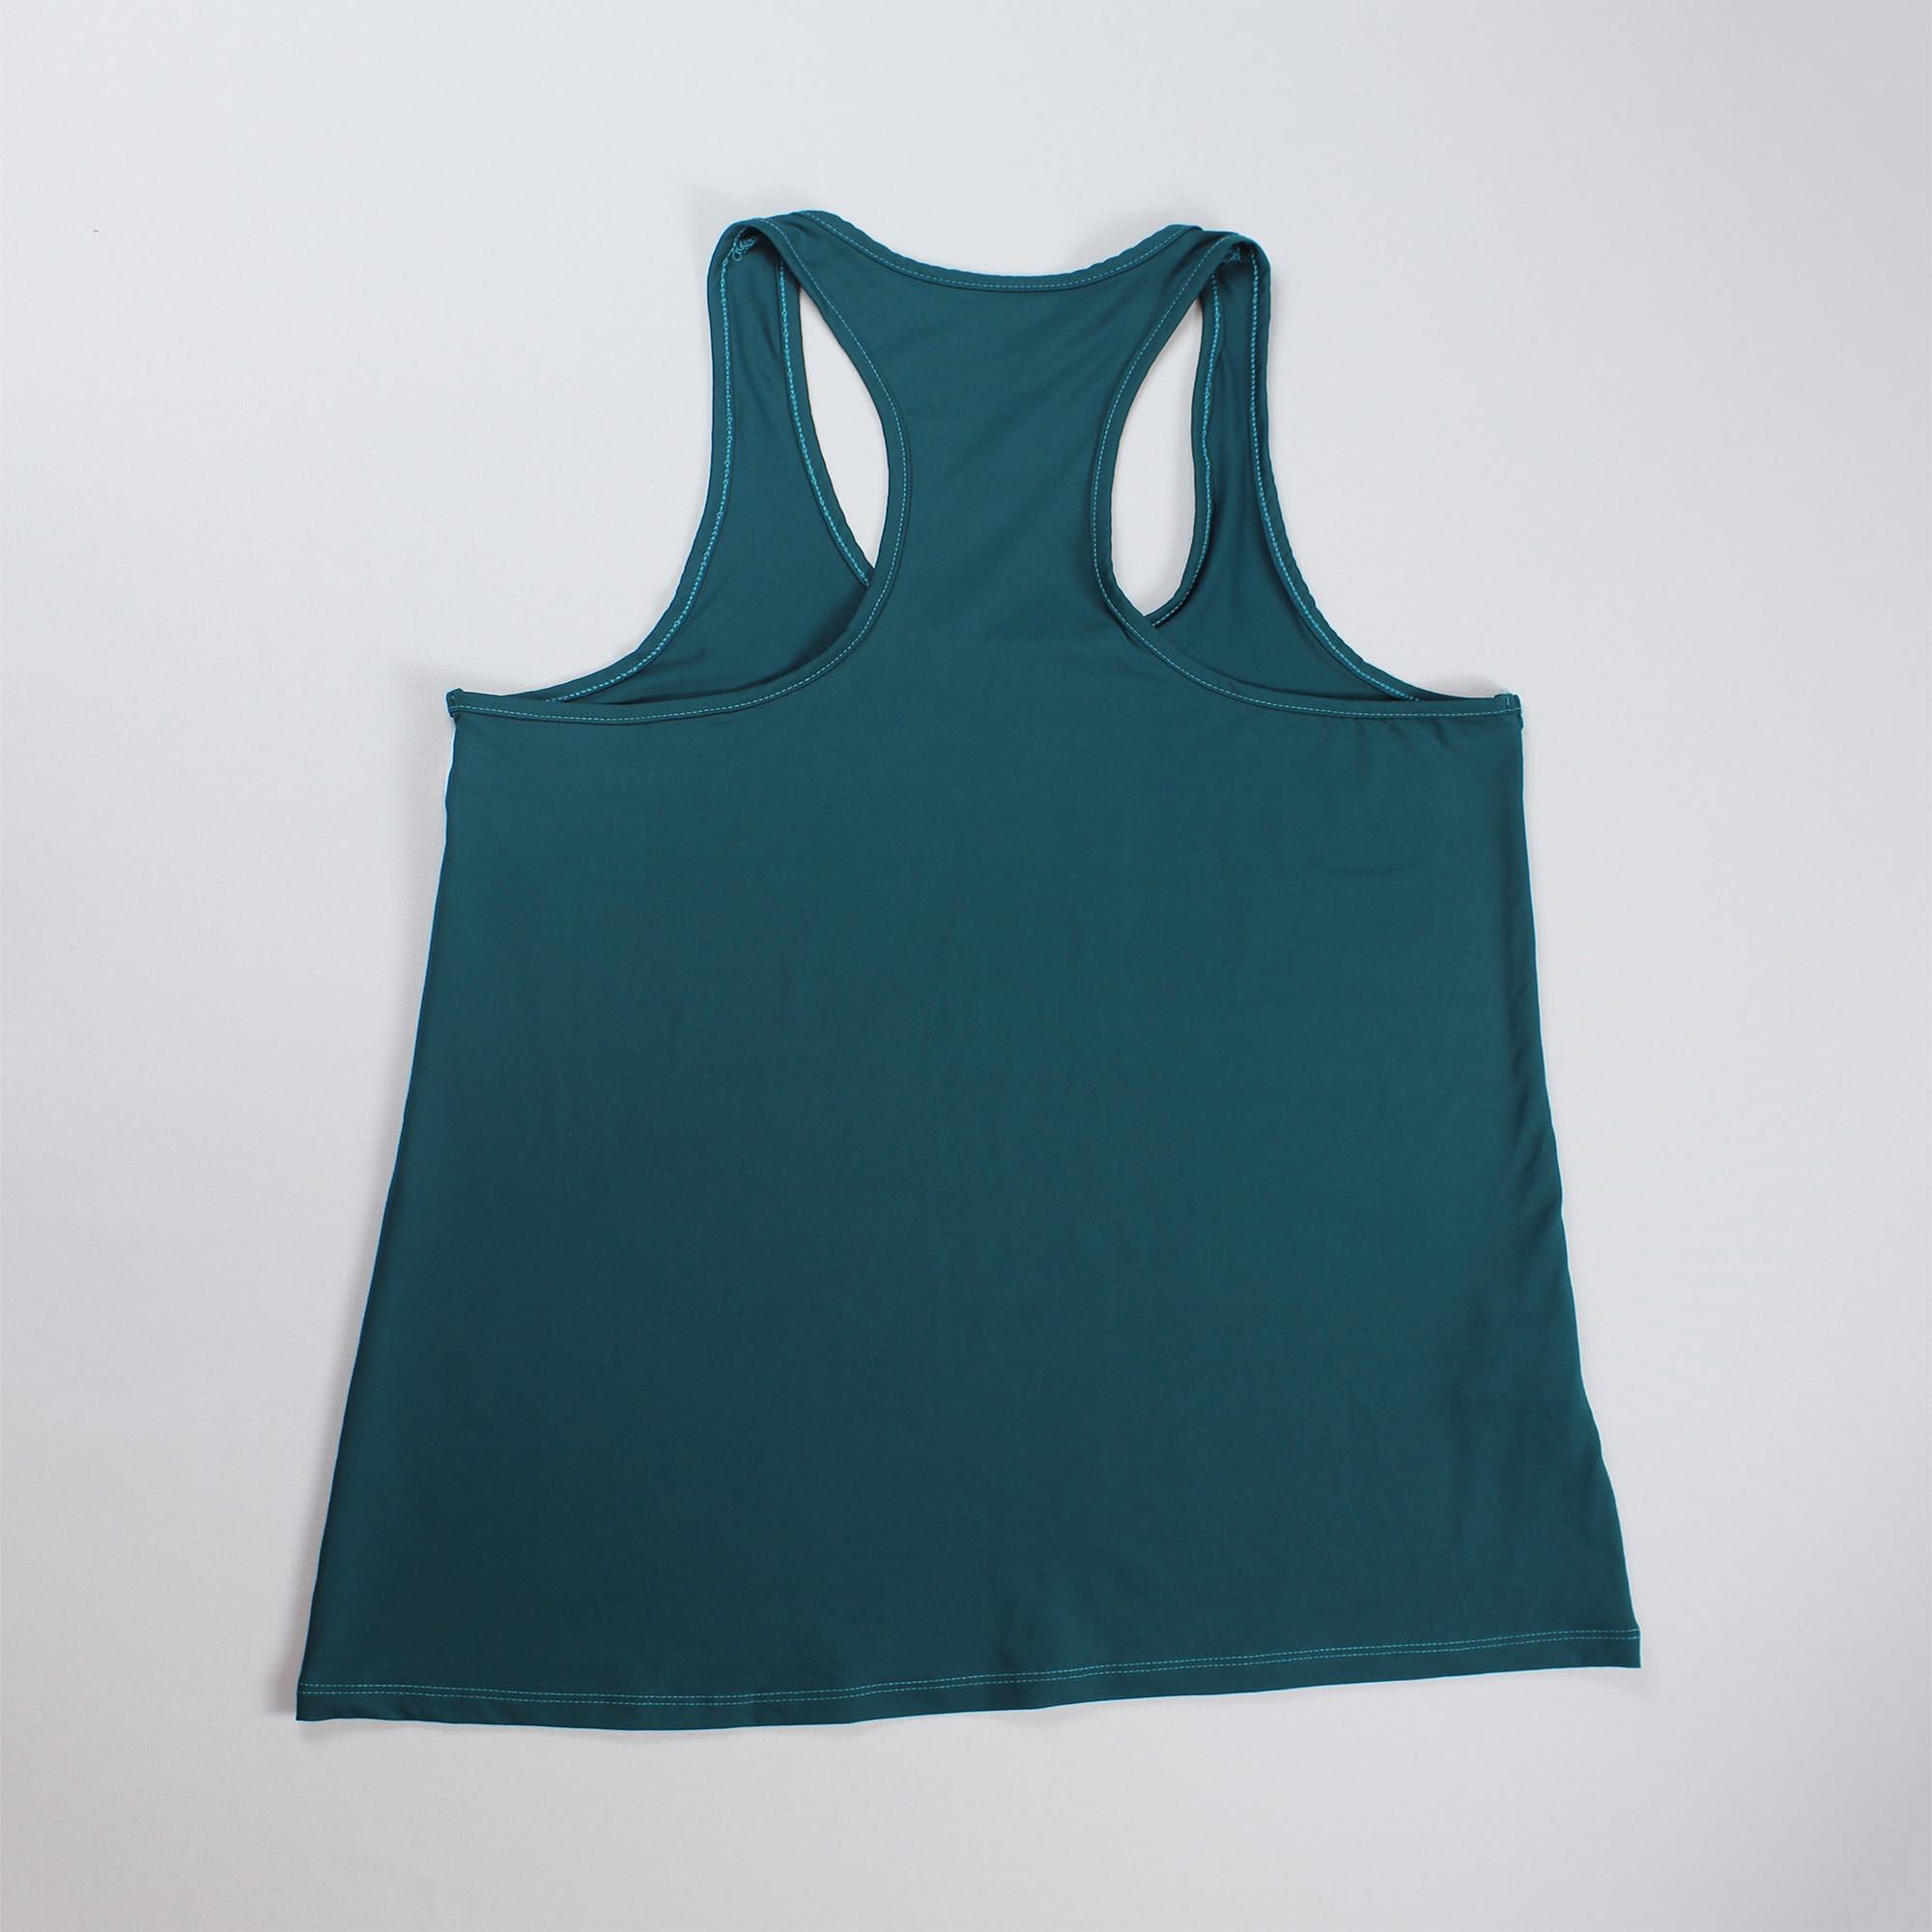 Regata Básica Nadadora Feminina - Verde Petróleo